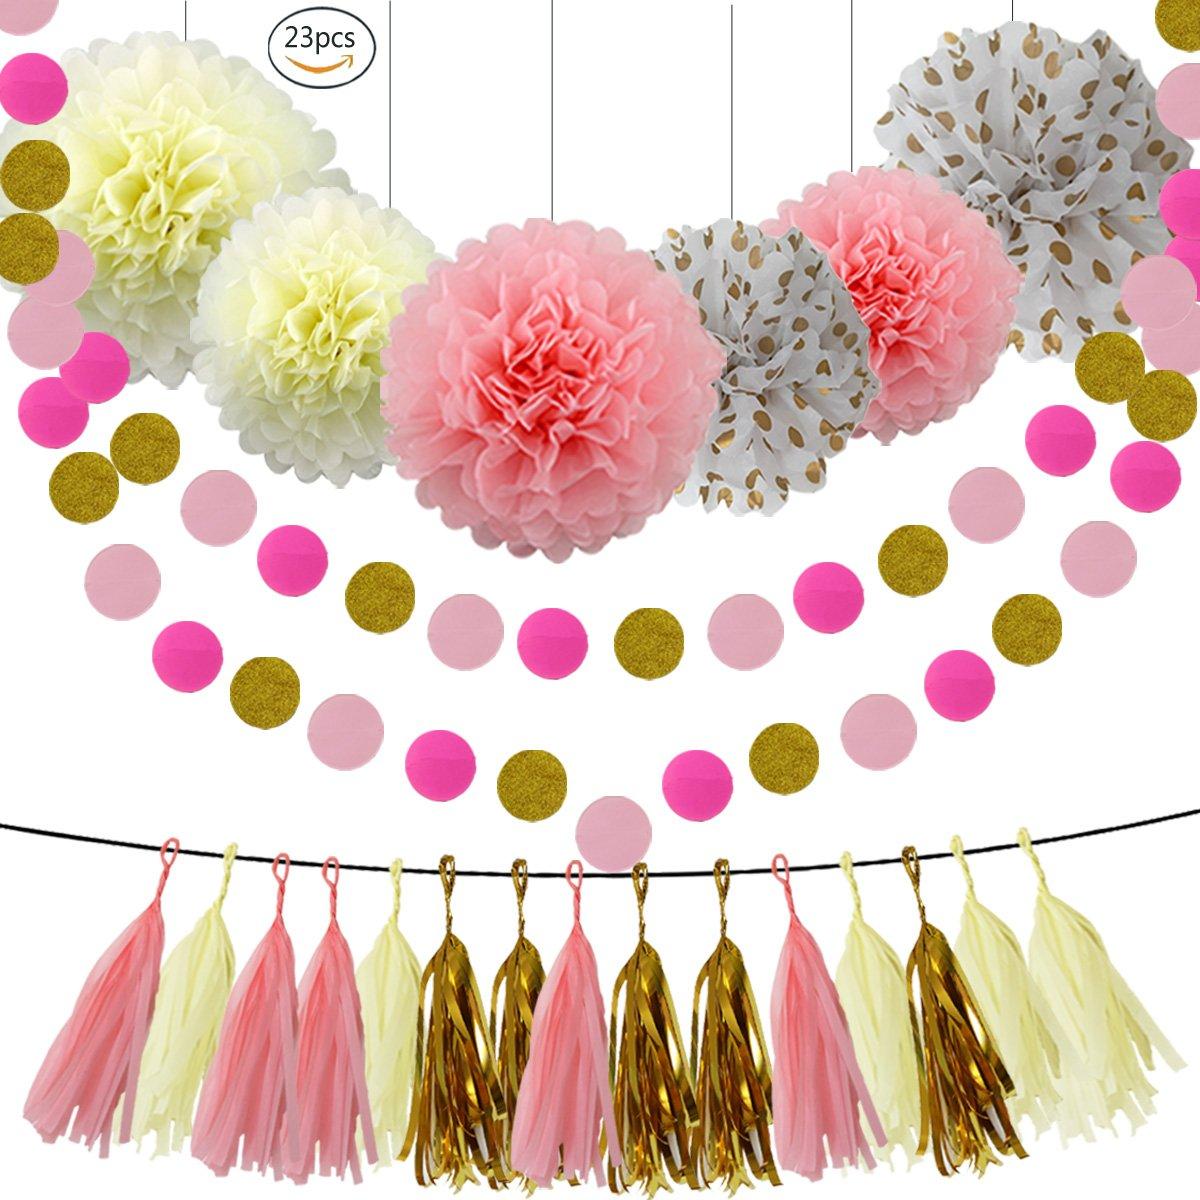 HEARTFEEL Baby Showers Decorations Kit 23pcs - Pink Cream Glitter Gold Paper Pom Poms,Tassel Garland Pink Gold Polka Dot Paper Garland for Baby Shower Wedding Nursery Decorations Bridal Shower